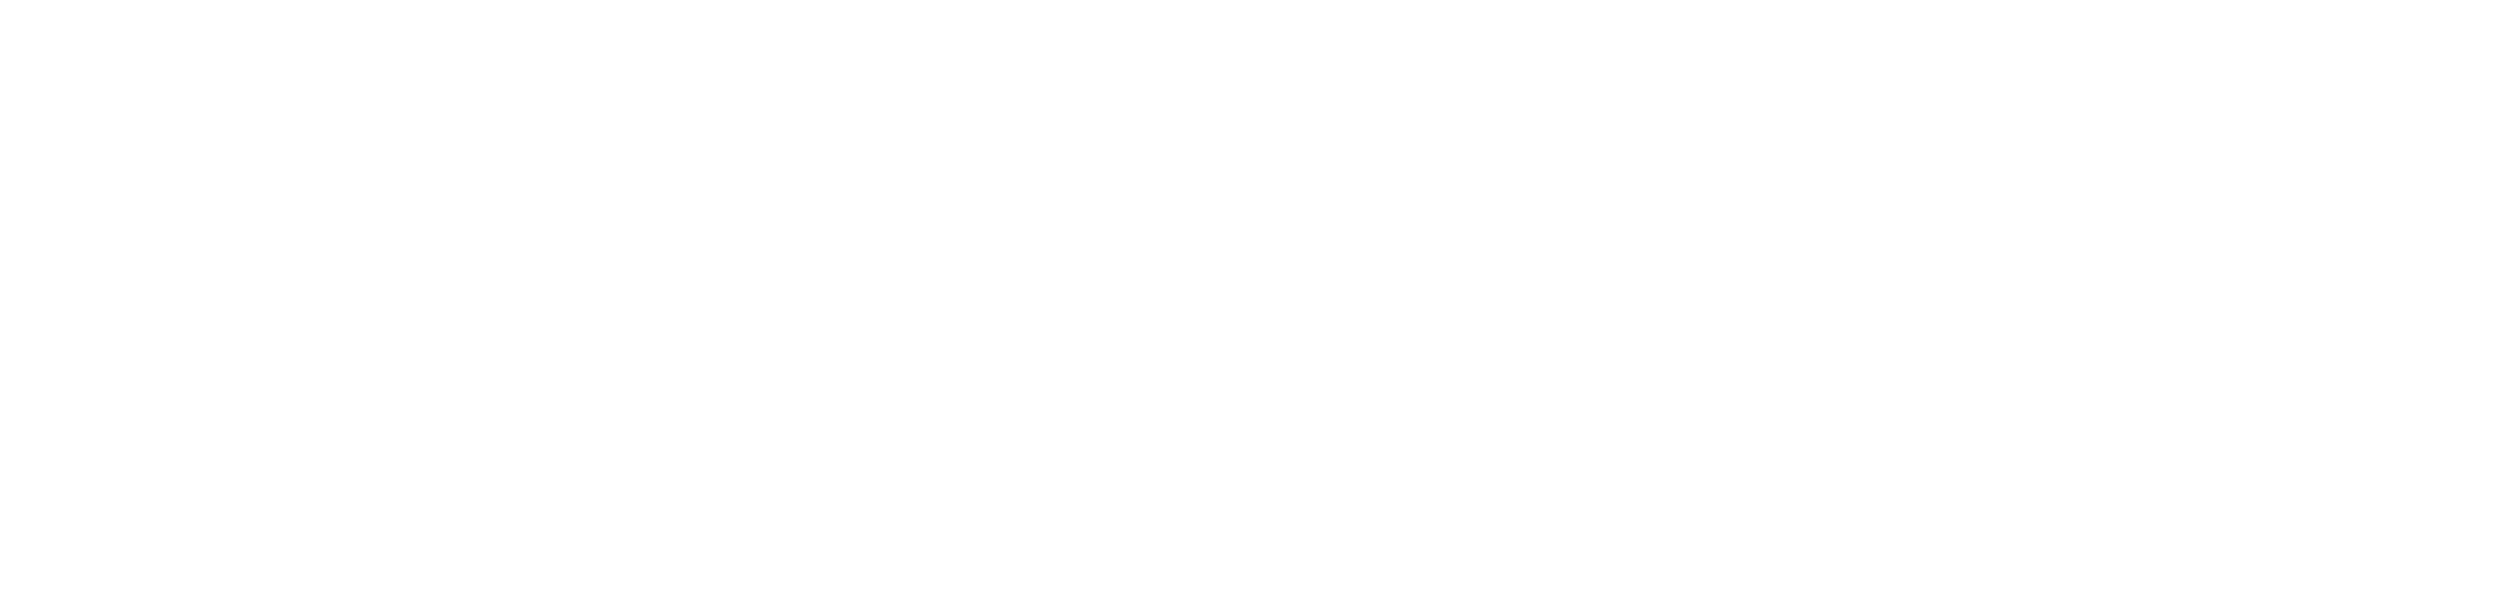 BeTemple